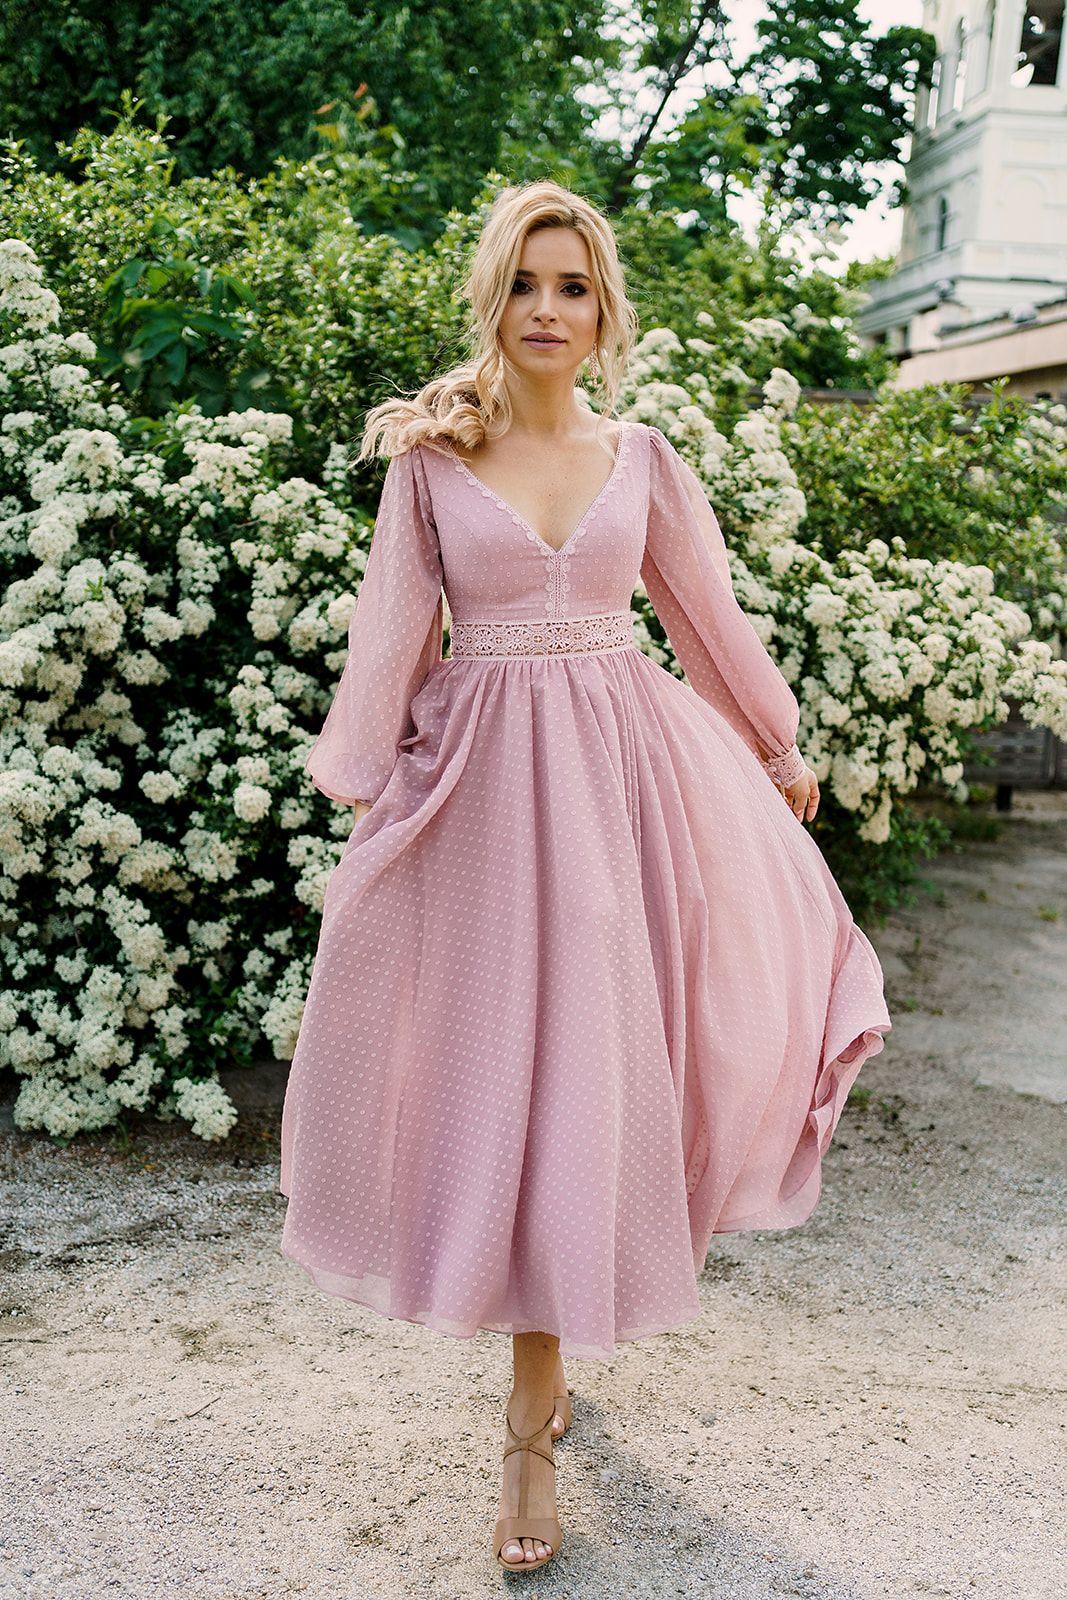 Sukienka Na Wesele Dotty I Nowa Kolekcja 2020 2021 Pracowni Sukni Dama Couture Z Warszawy Dresses Fashion Outfits